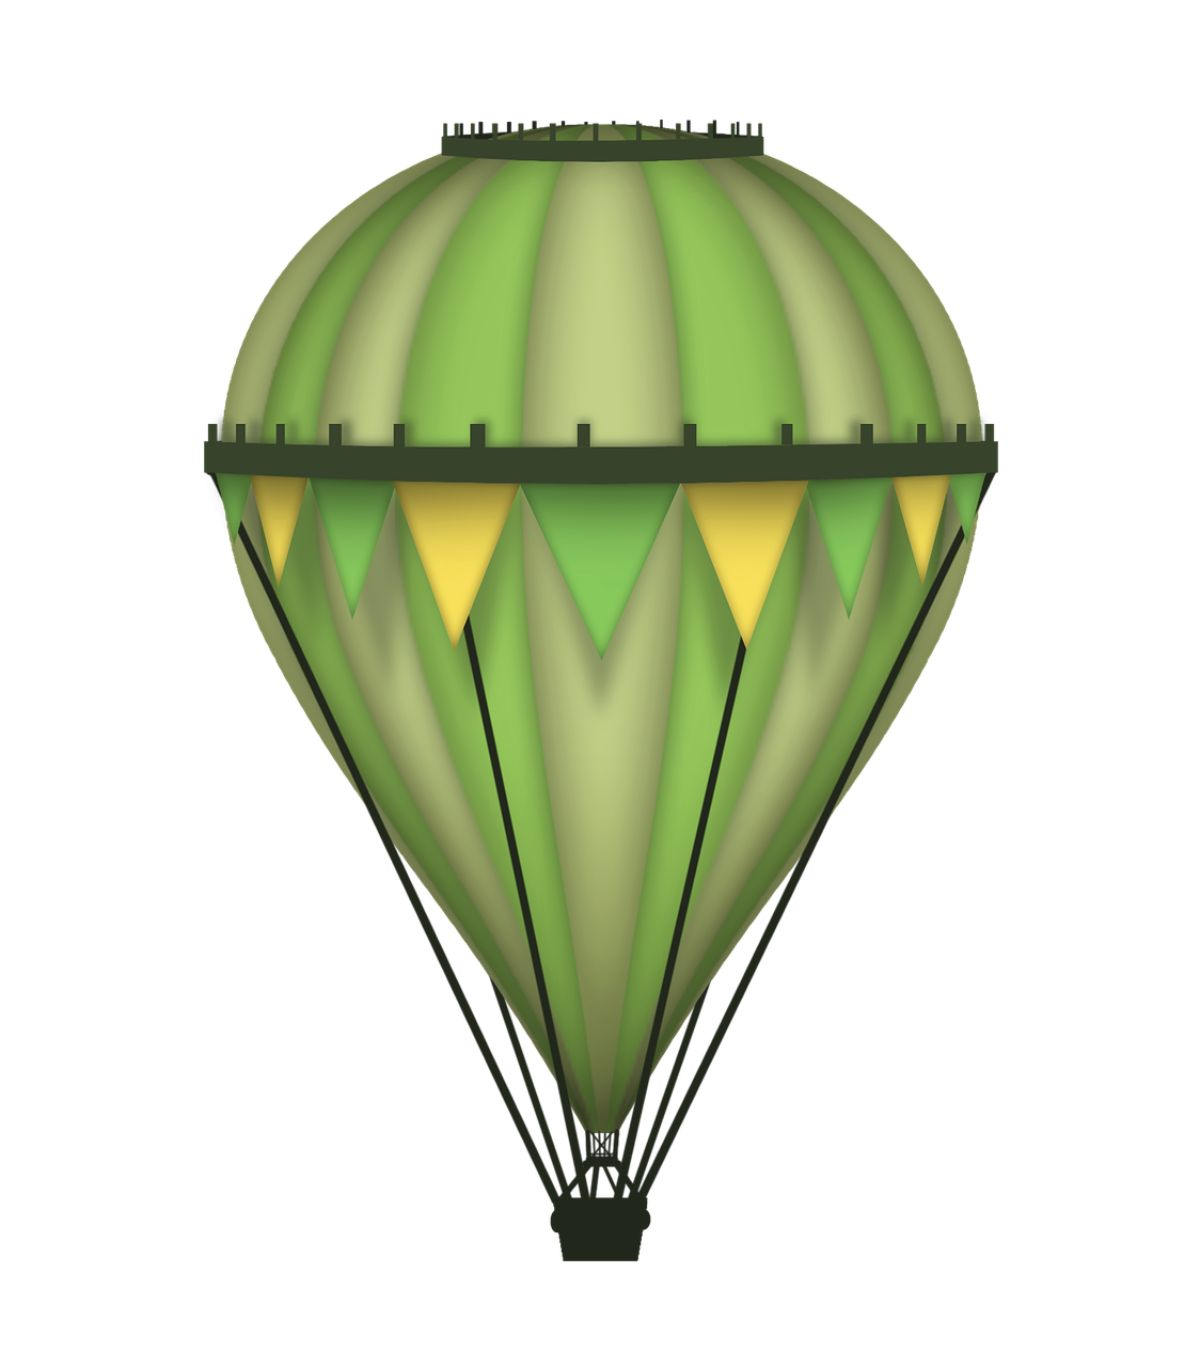 big green parachute